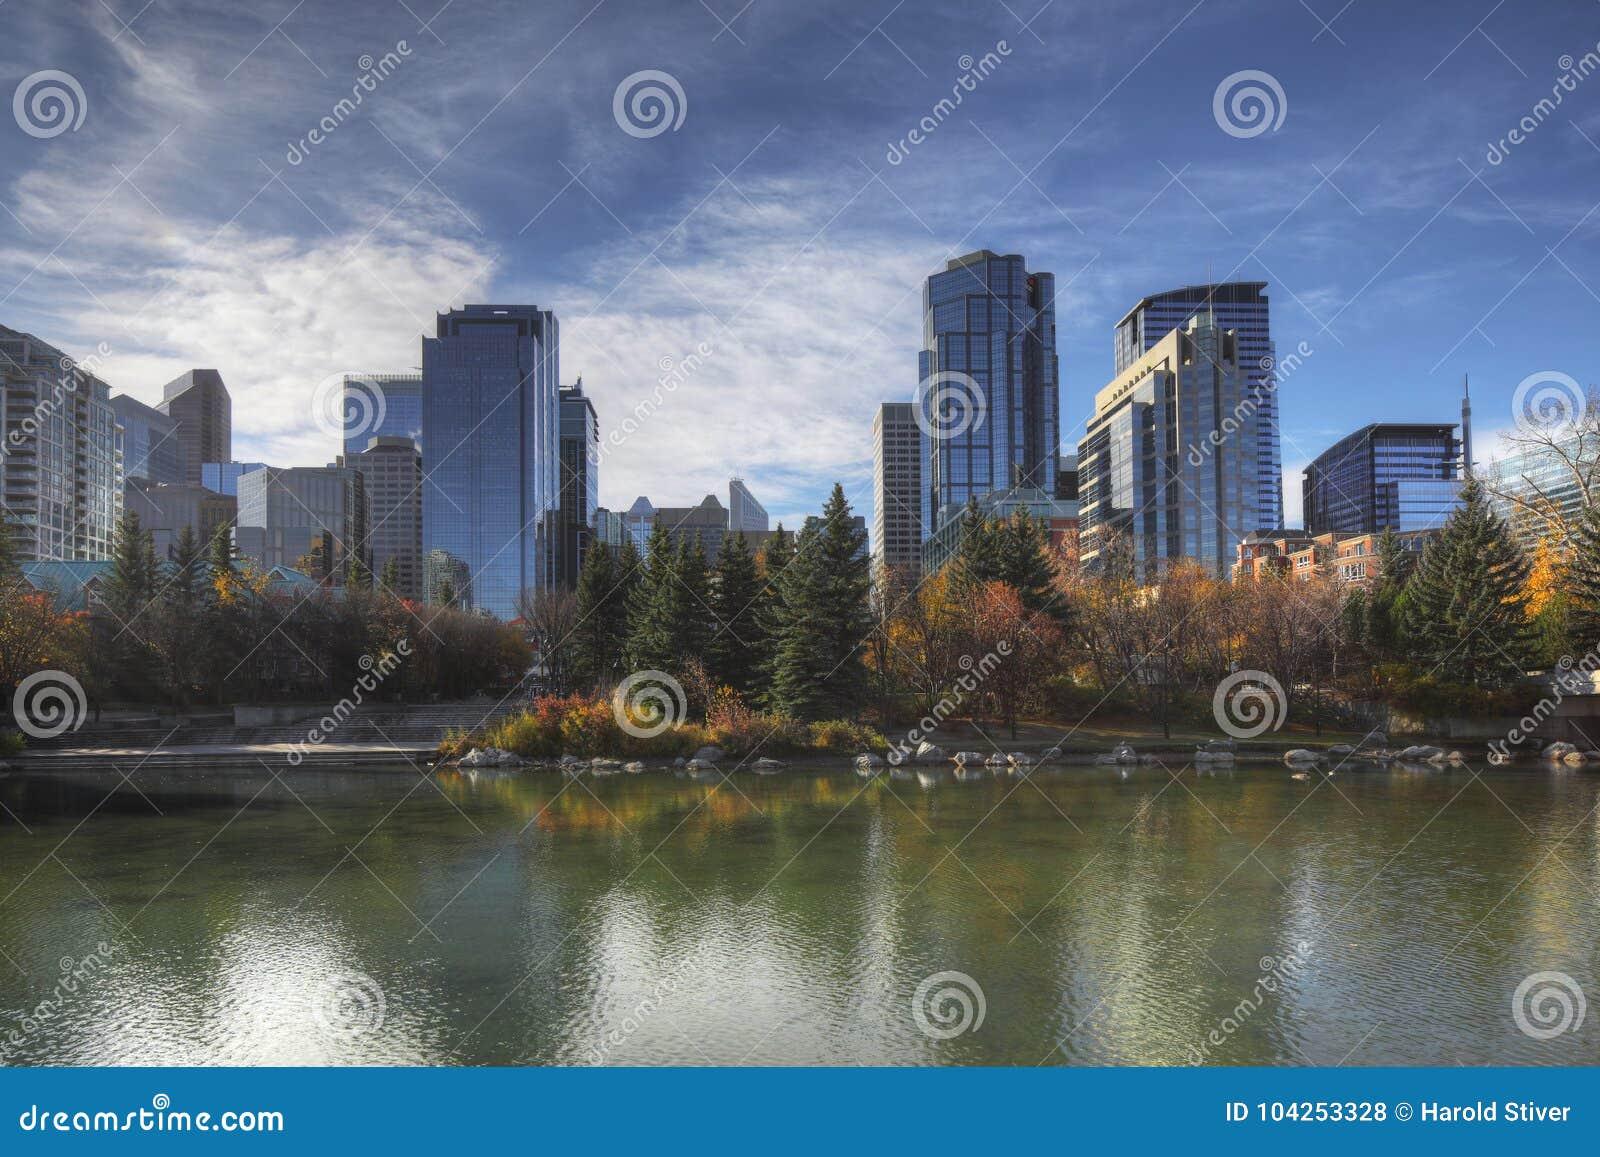 Skyline Calgarys, Kanada mit Herbstlaub